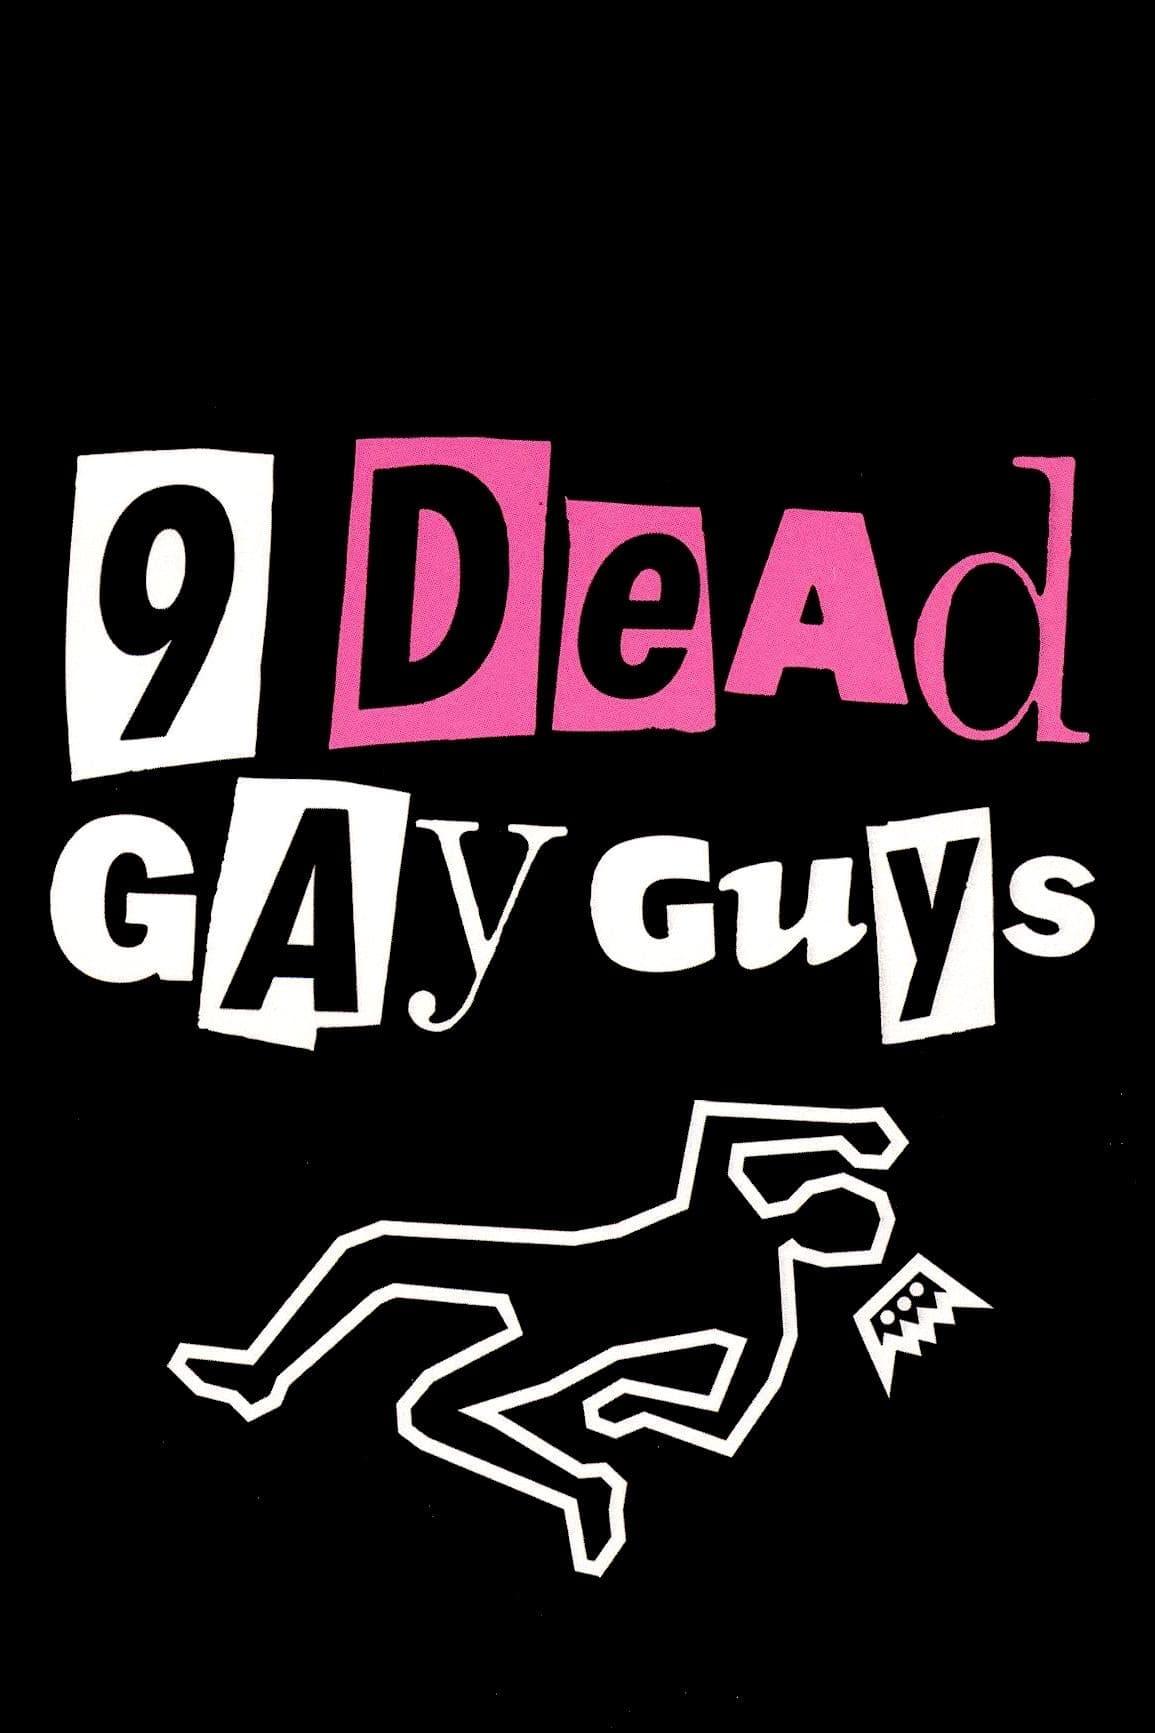 9 Dead Gay Guys